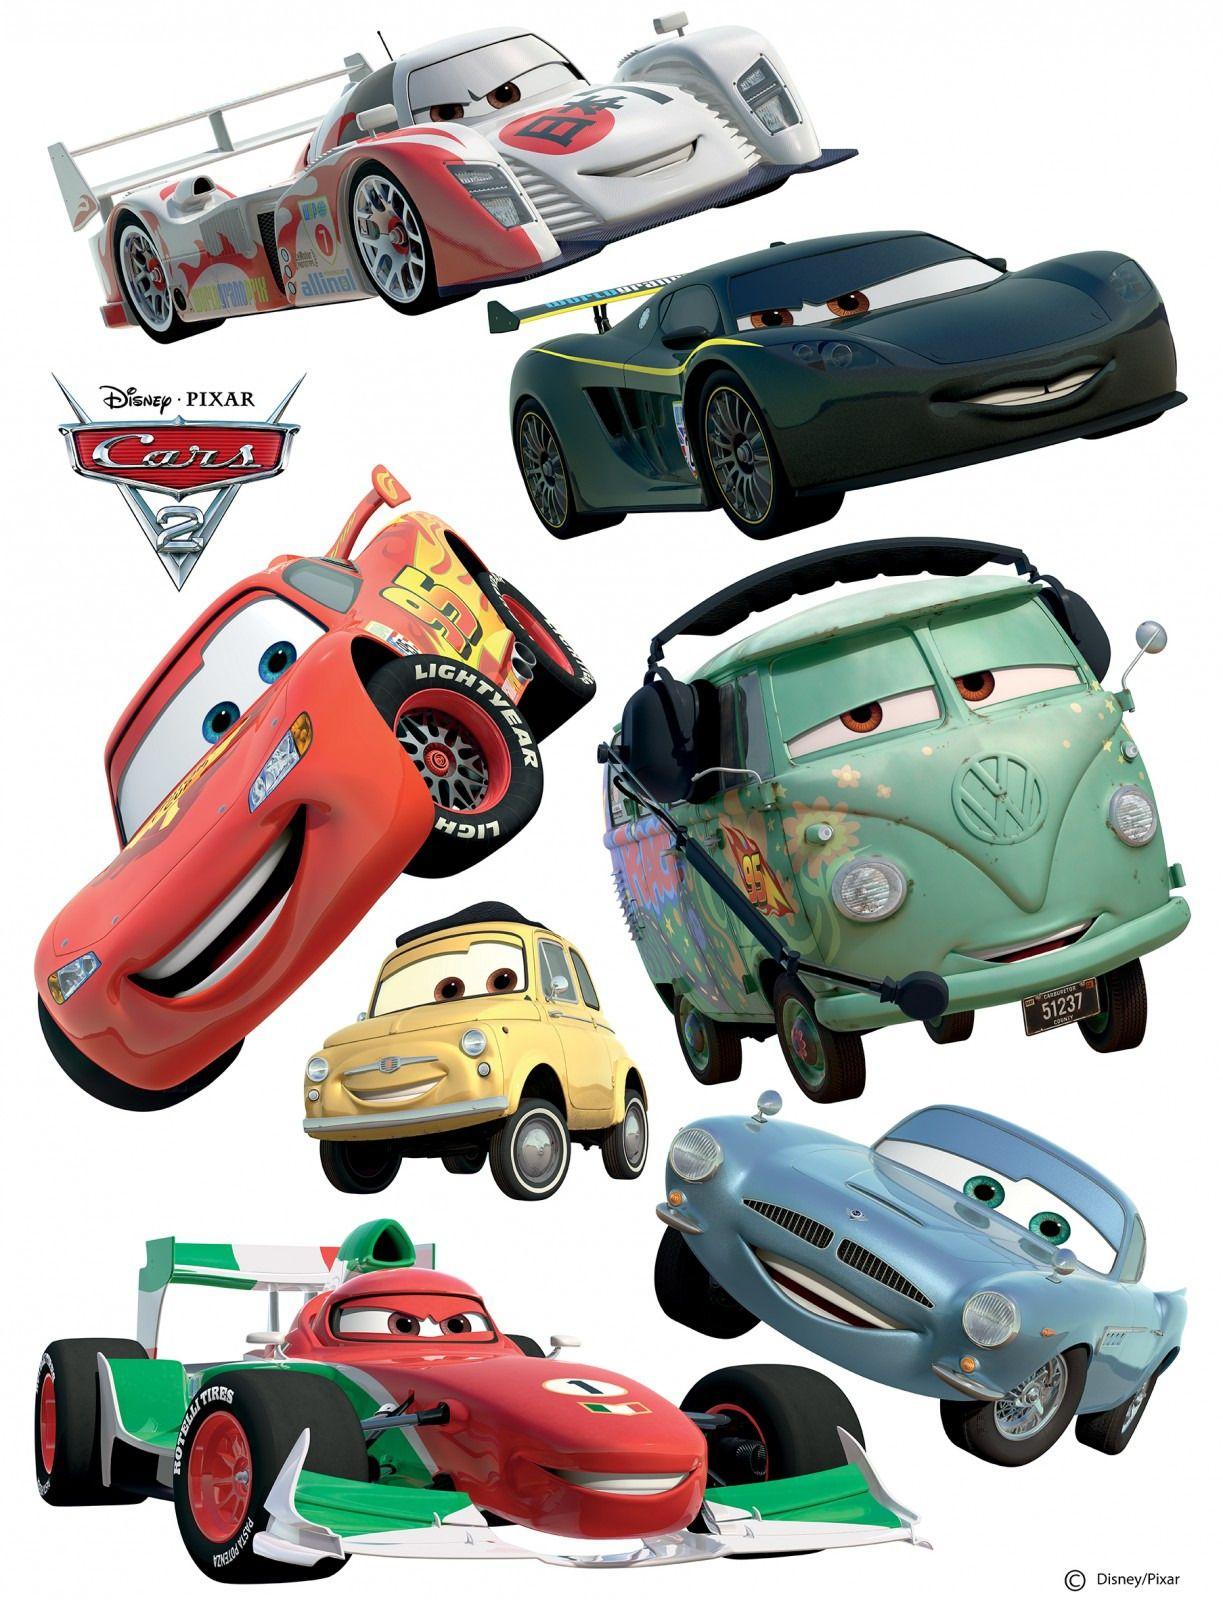 Disney Cars Bathroom Decor 2021 Disney Cars Sticker Decor Wall Stickers Cars [ 1600 x 1223 Pixel ]